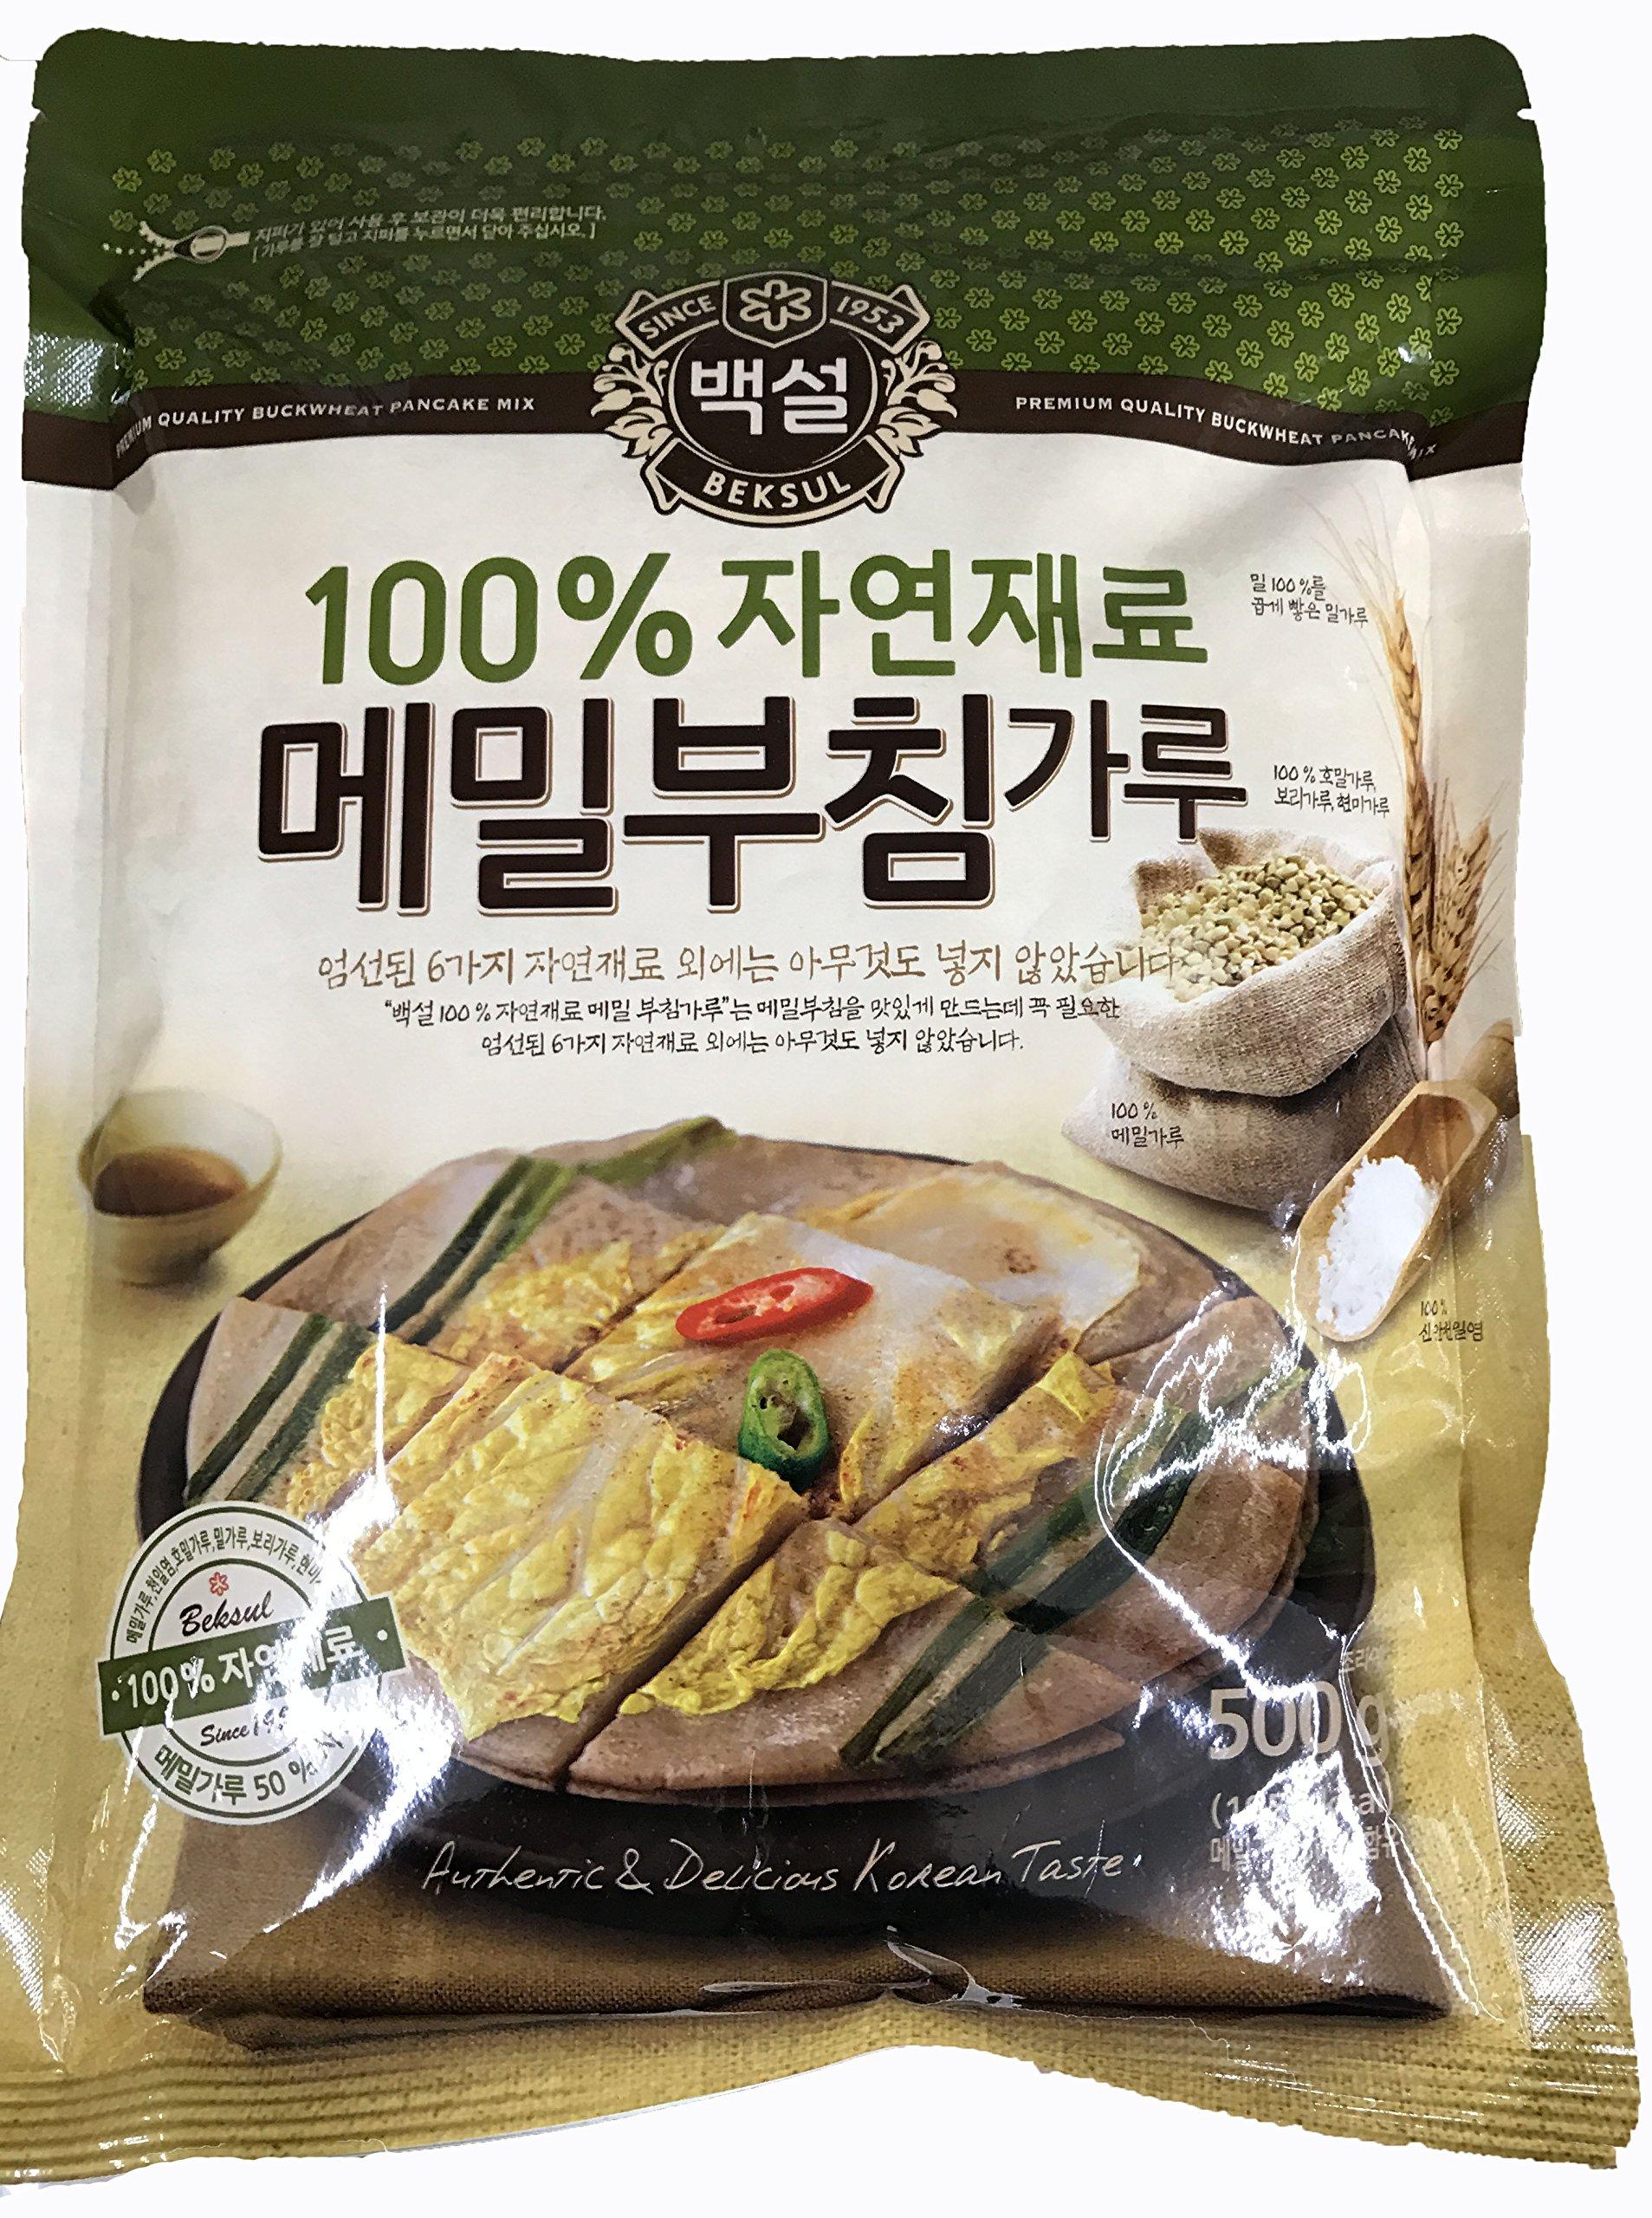 Beksul Natural Buckwheat(Memil) Pancakes Mix; 500g(1.1 pounds)